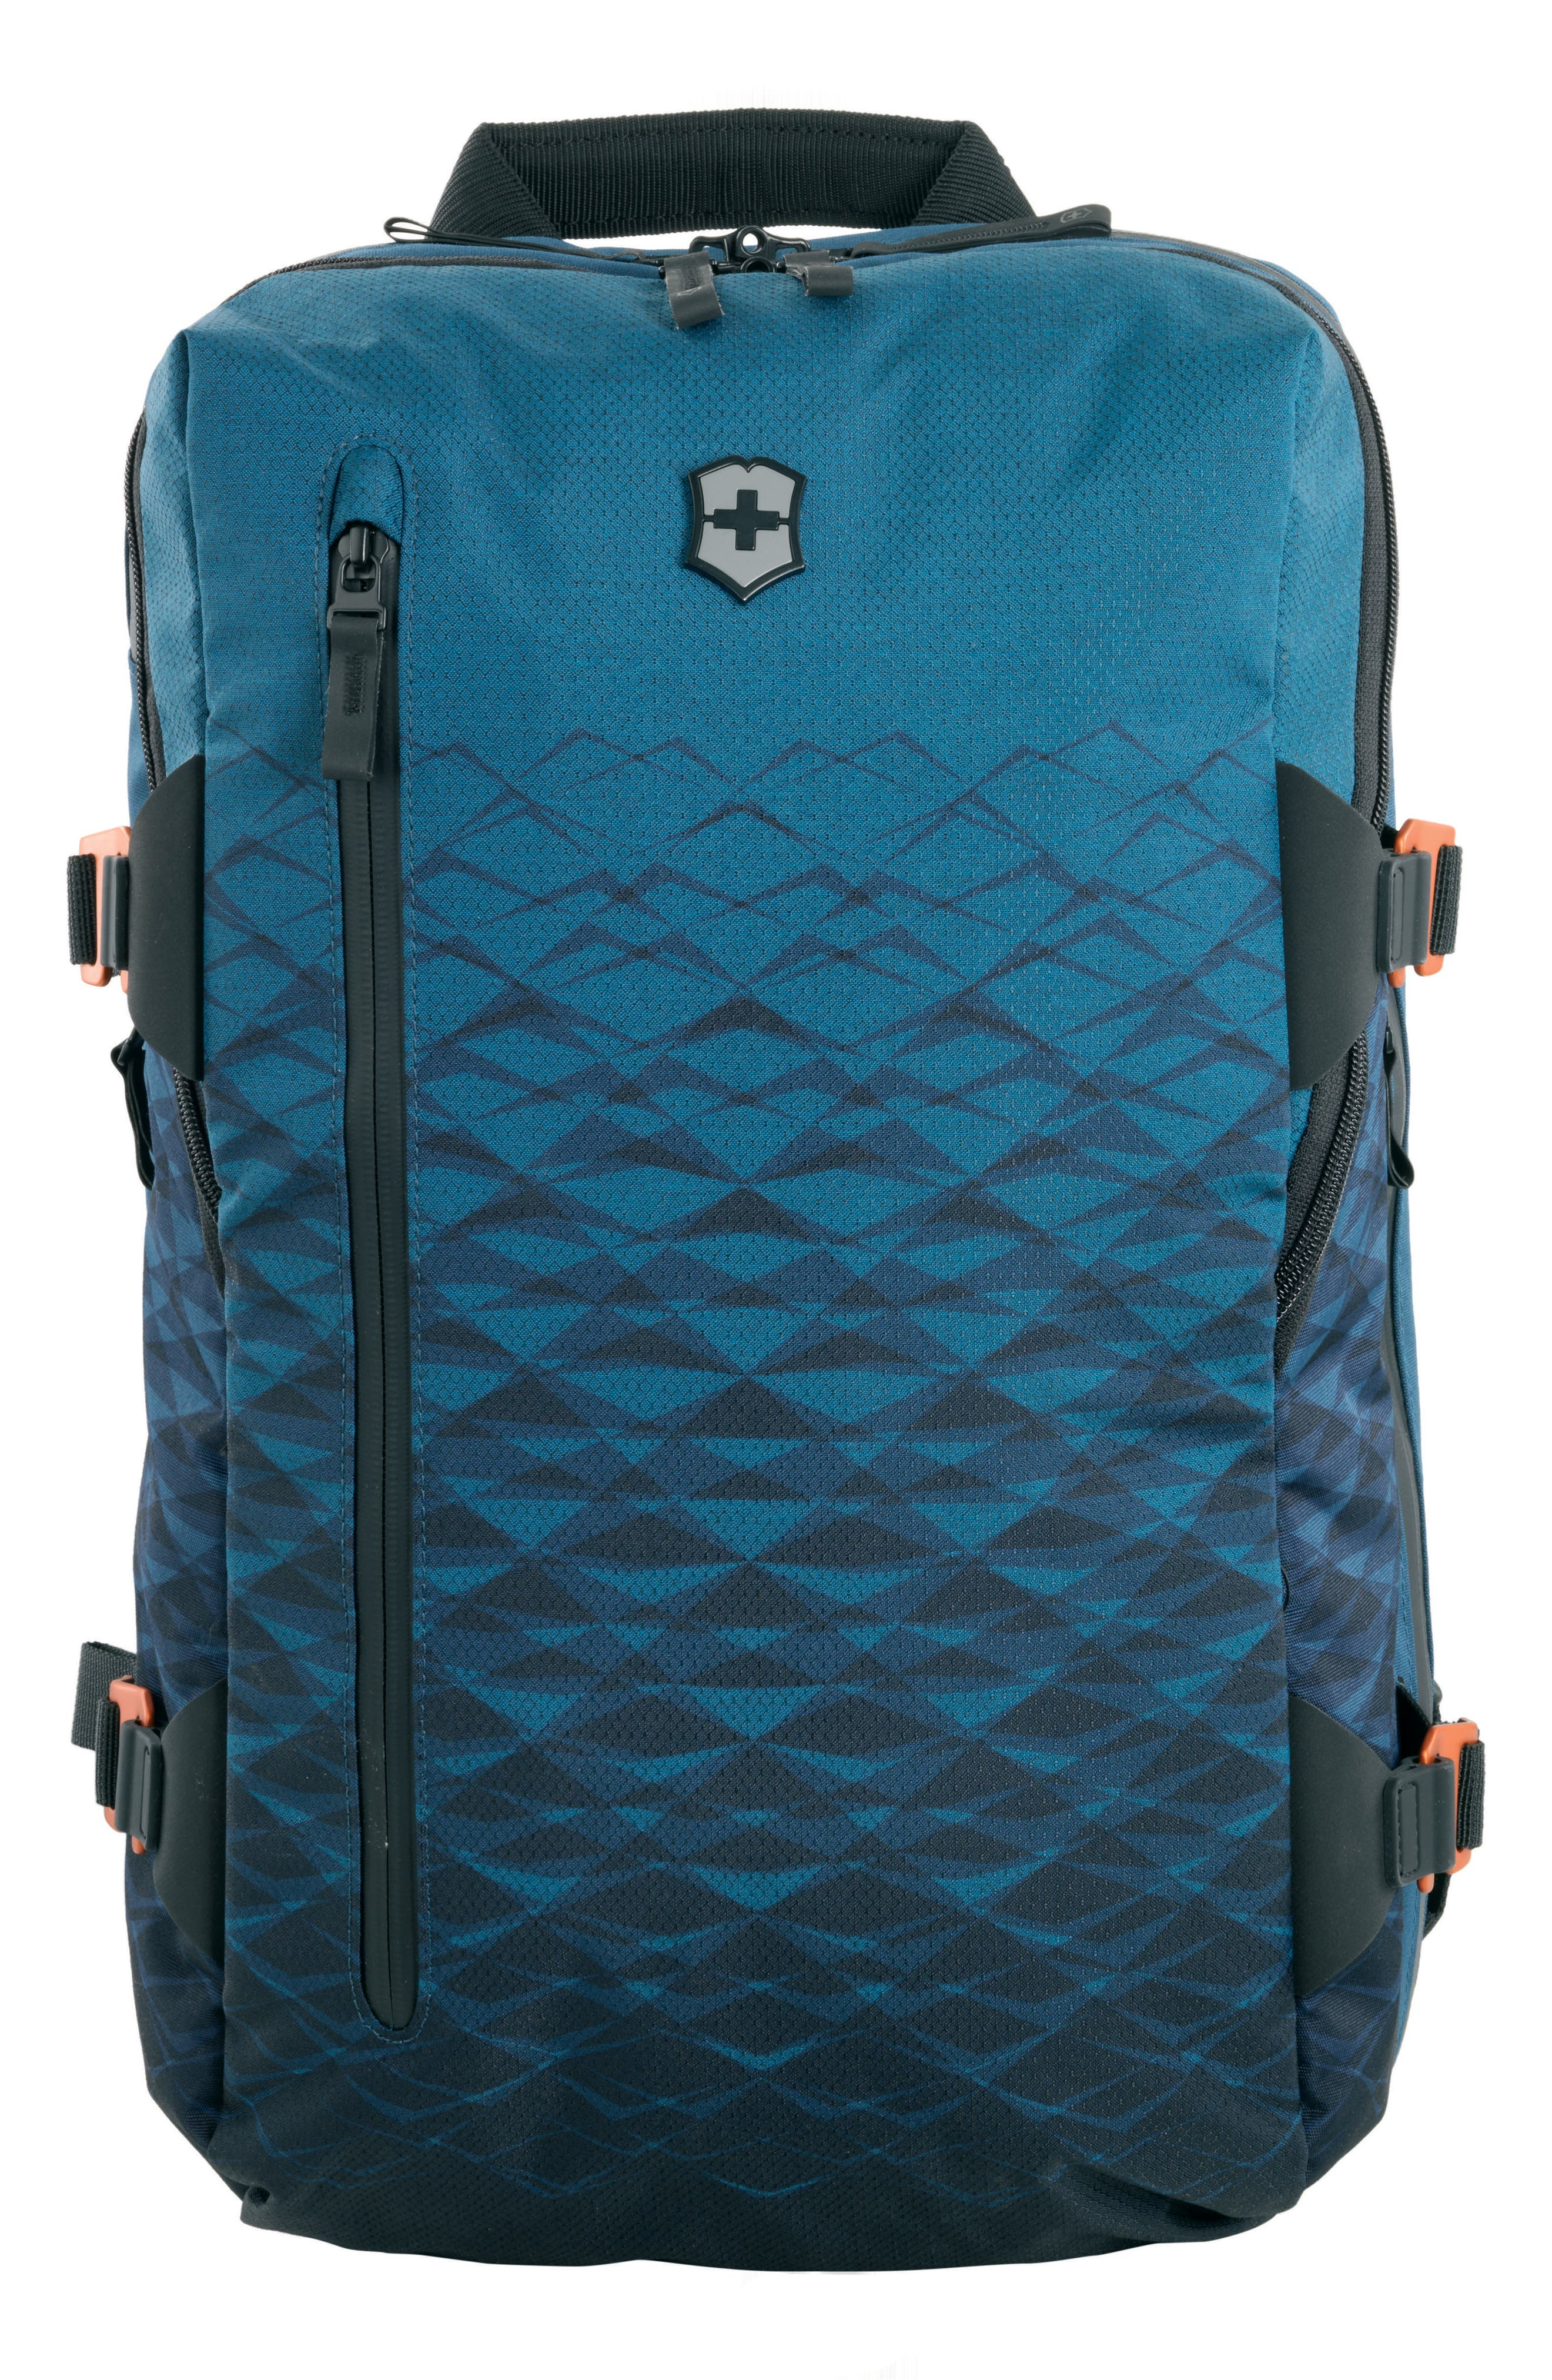 VX Touring Laptop Backpack,                             Main thumbnail 1, color,                             DARK TEAL